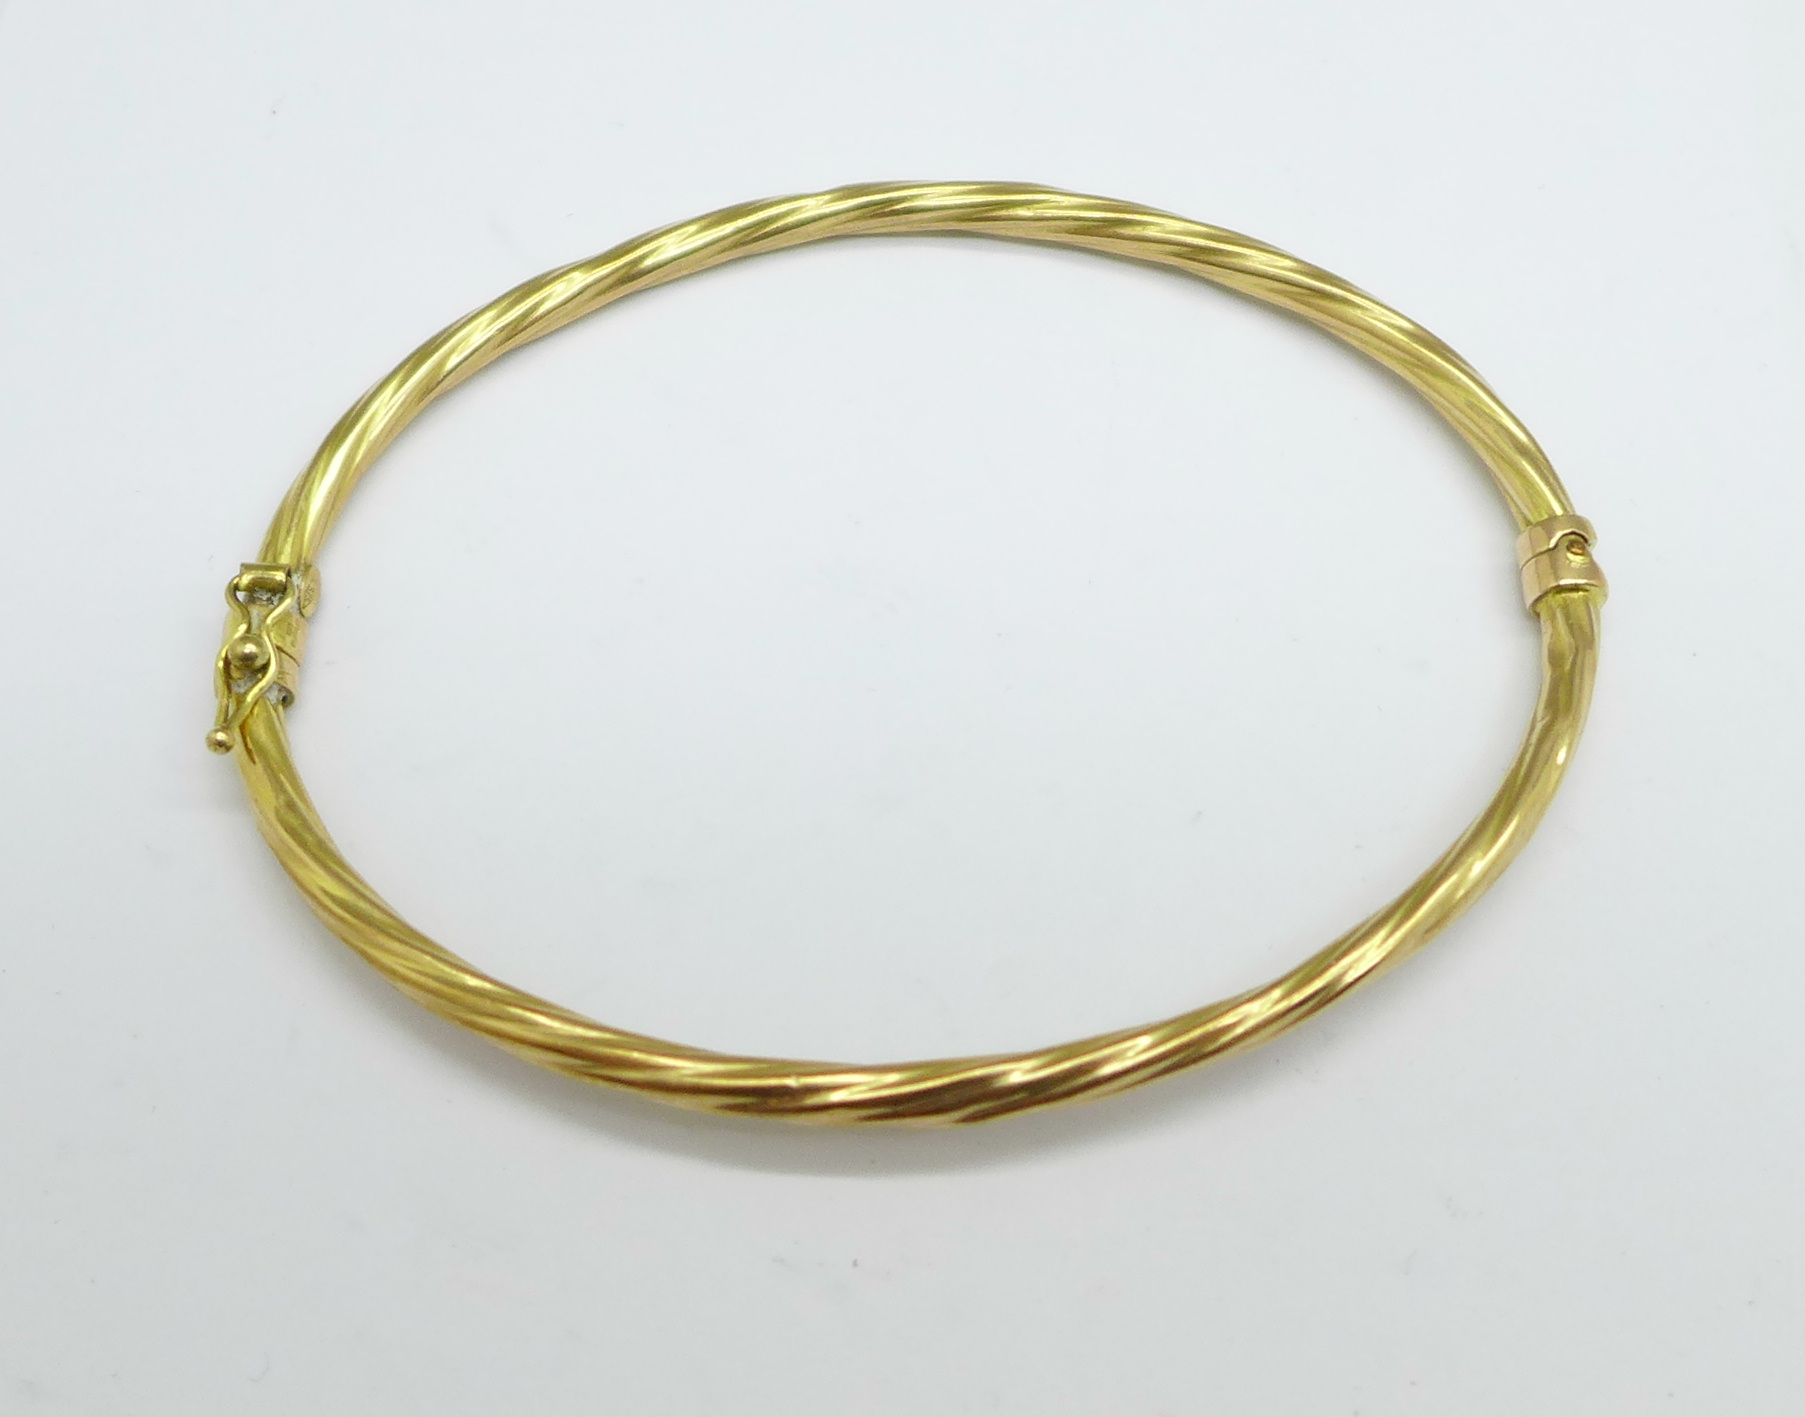 A 9ct gold bangle, 3.2g